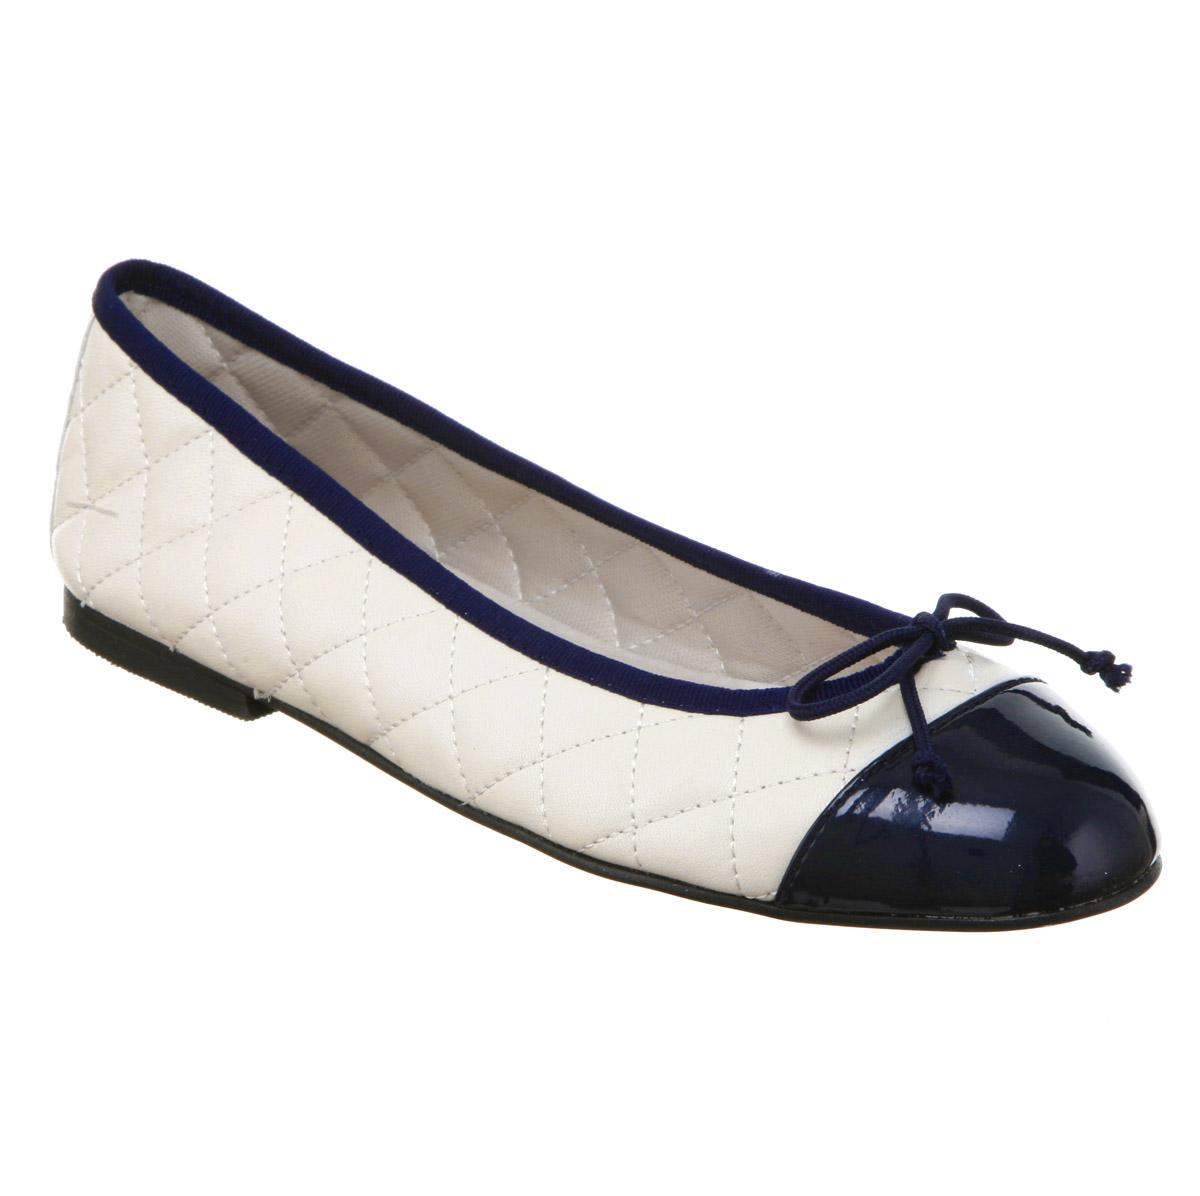 Cream Pumps Womens Shoes